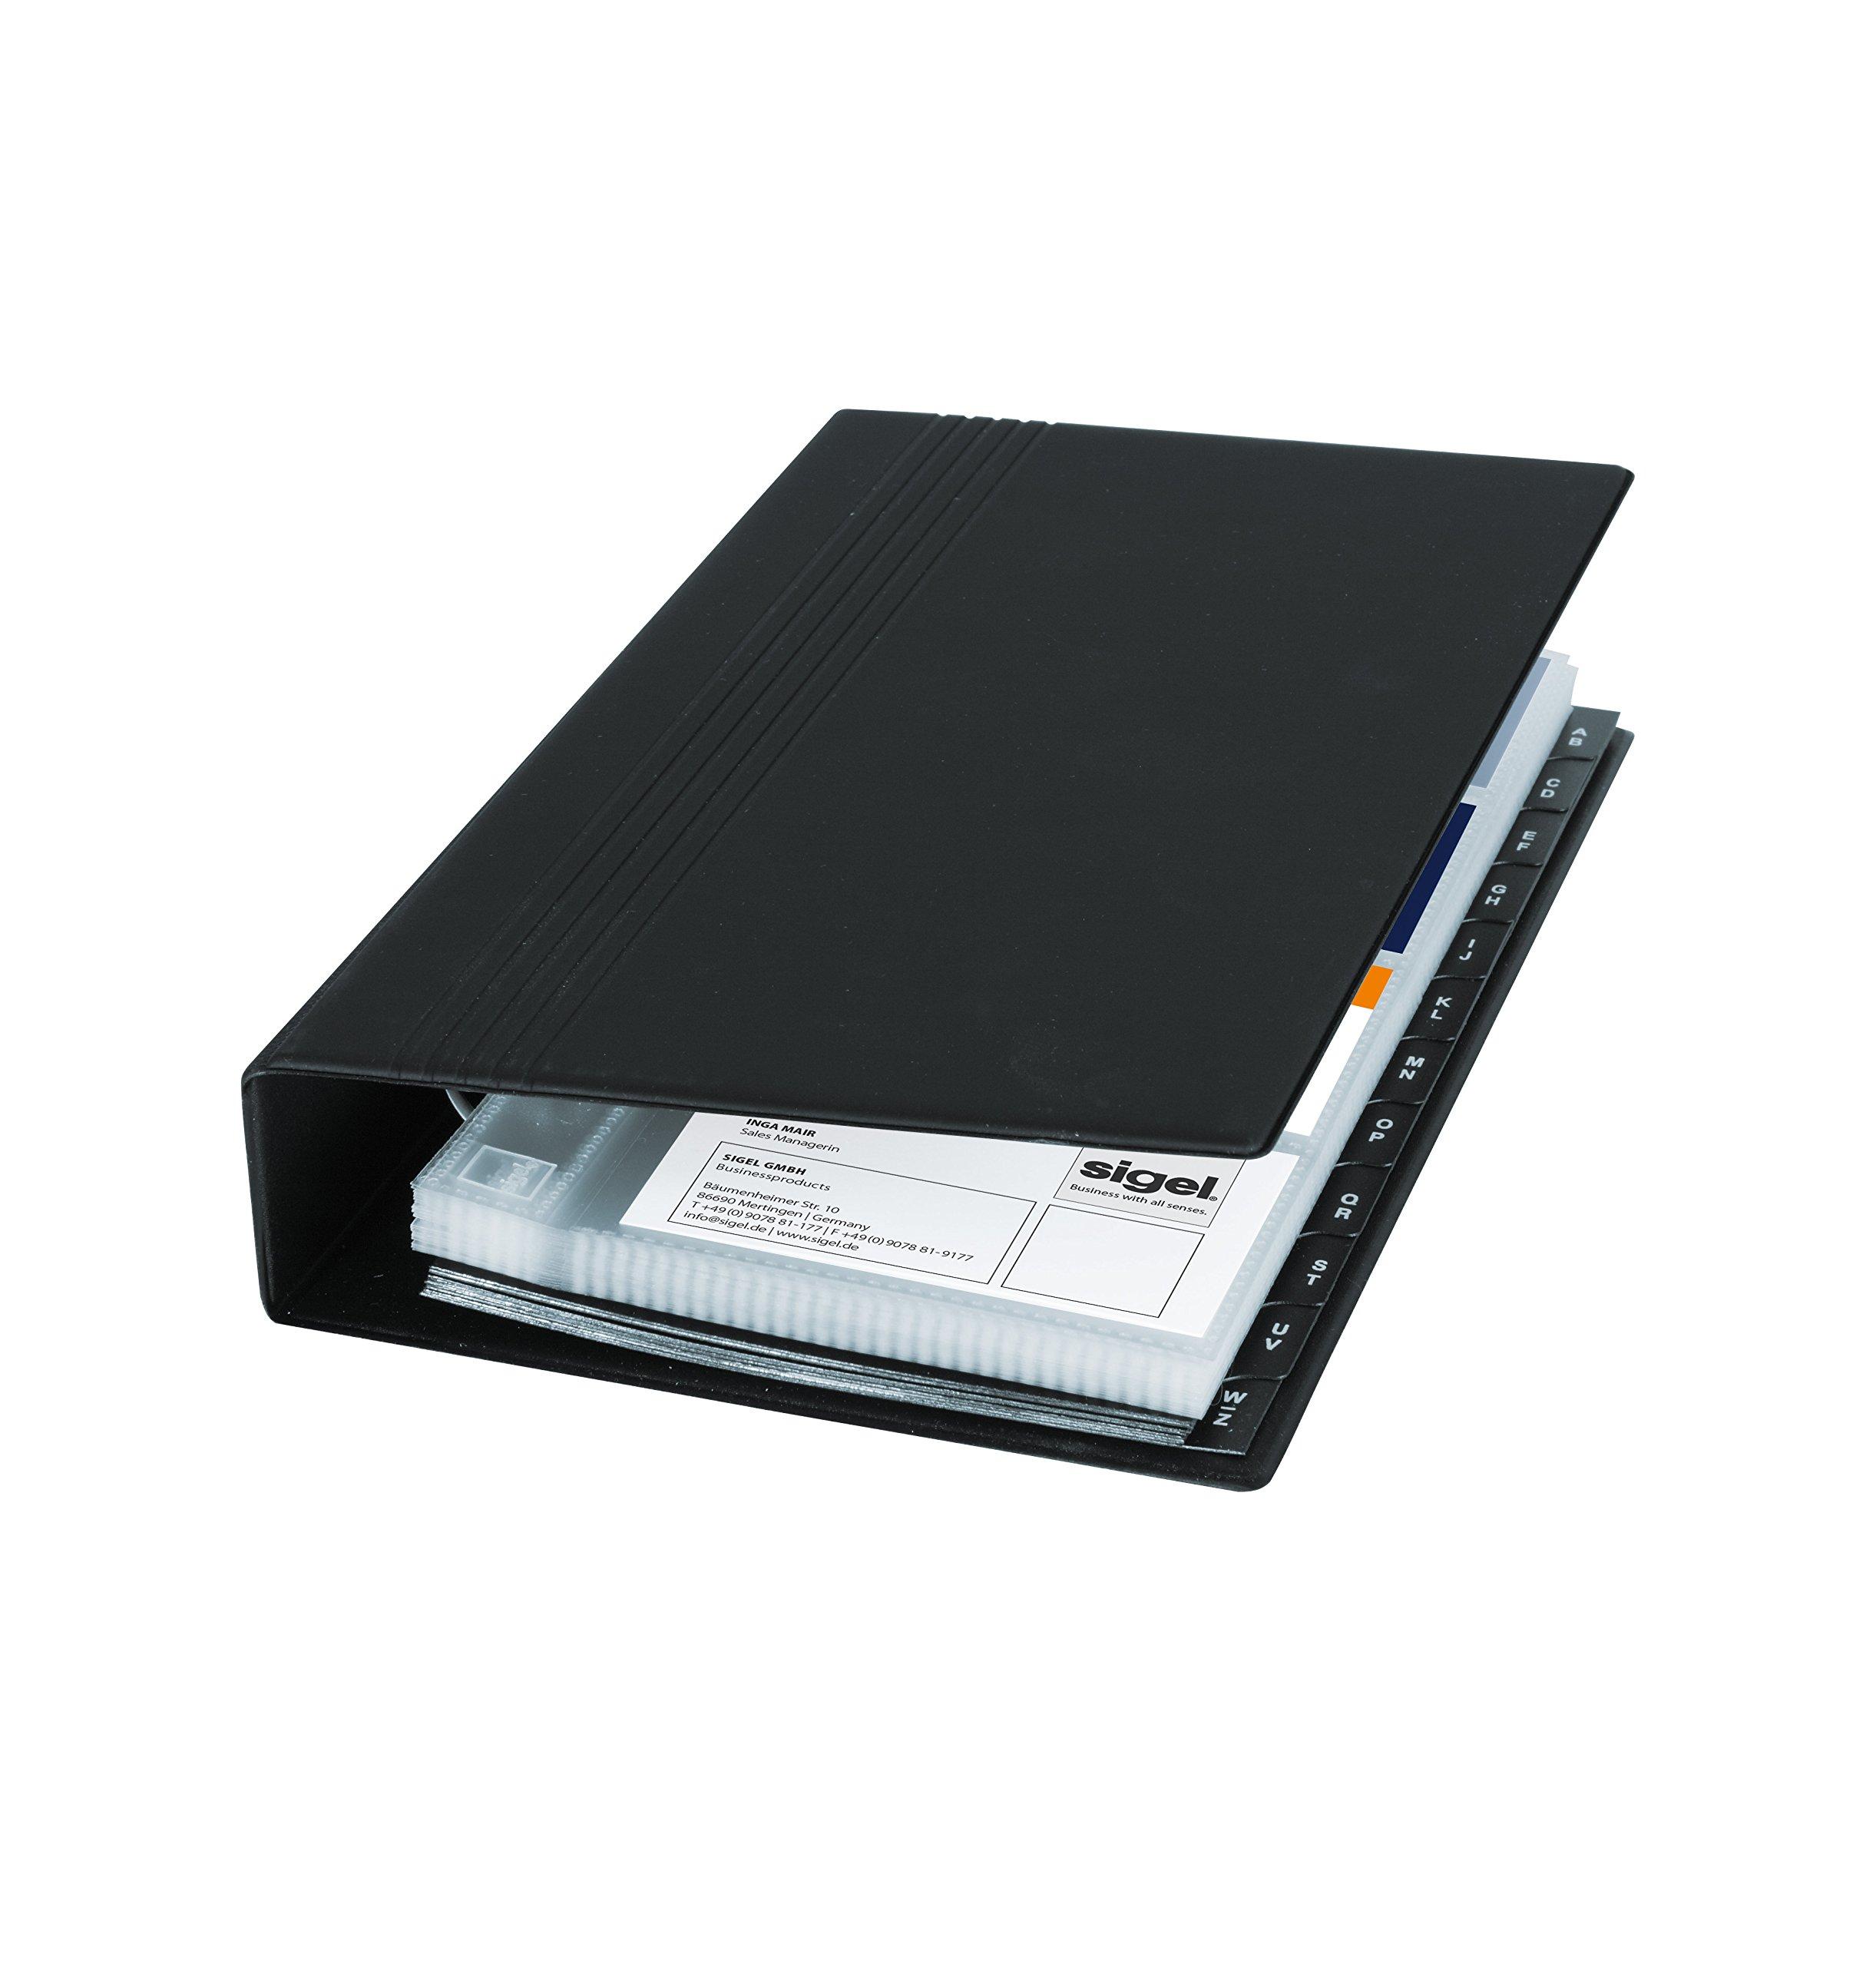 Sigel VZ300 Business Card Organiser, one row, black, matt, with 25 clear plastic pockets, index A-Z, 4-ring-mechanism